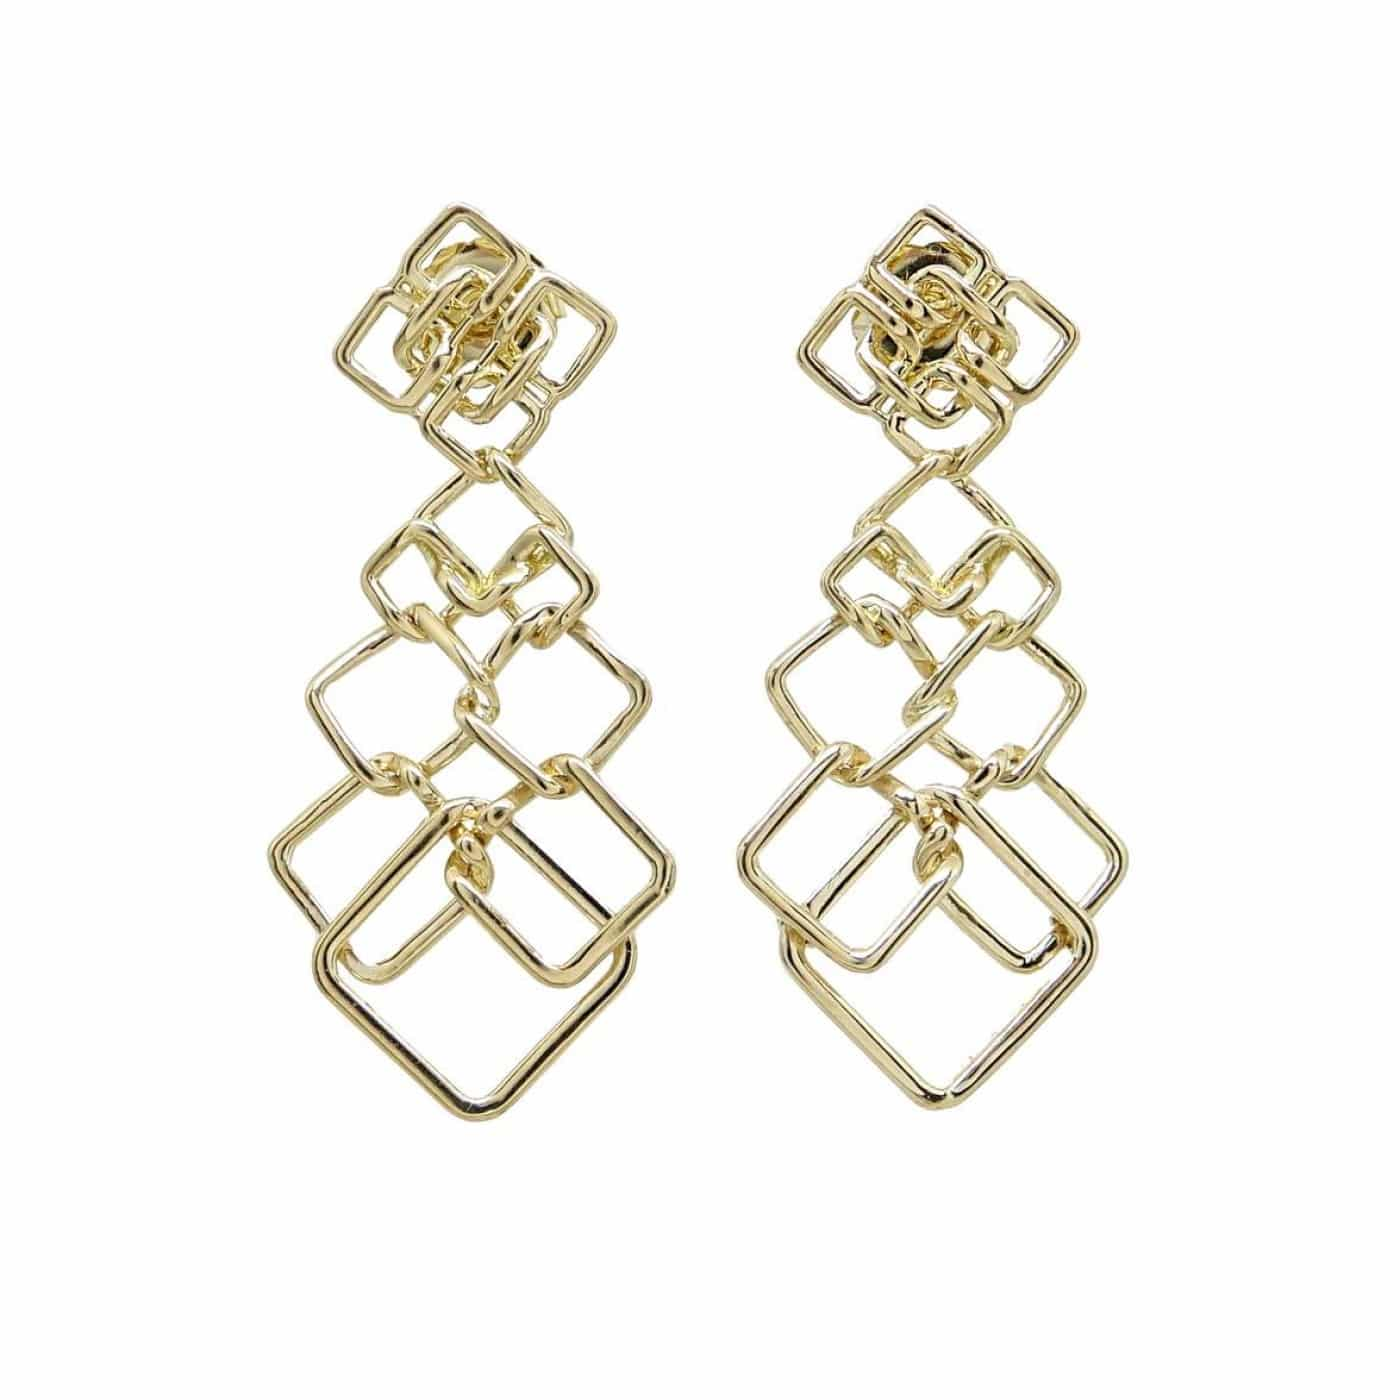 Valentin Margo Interlocking Earrings